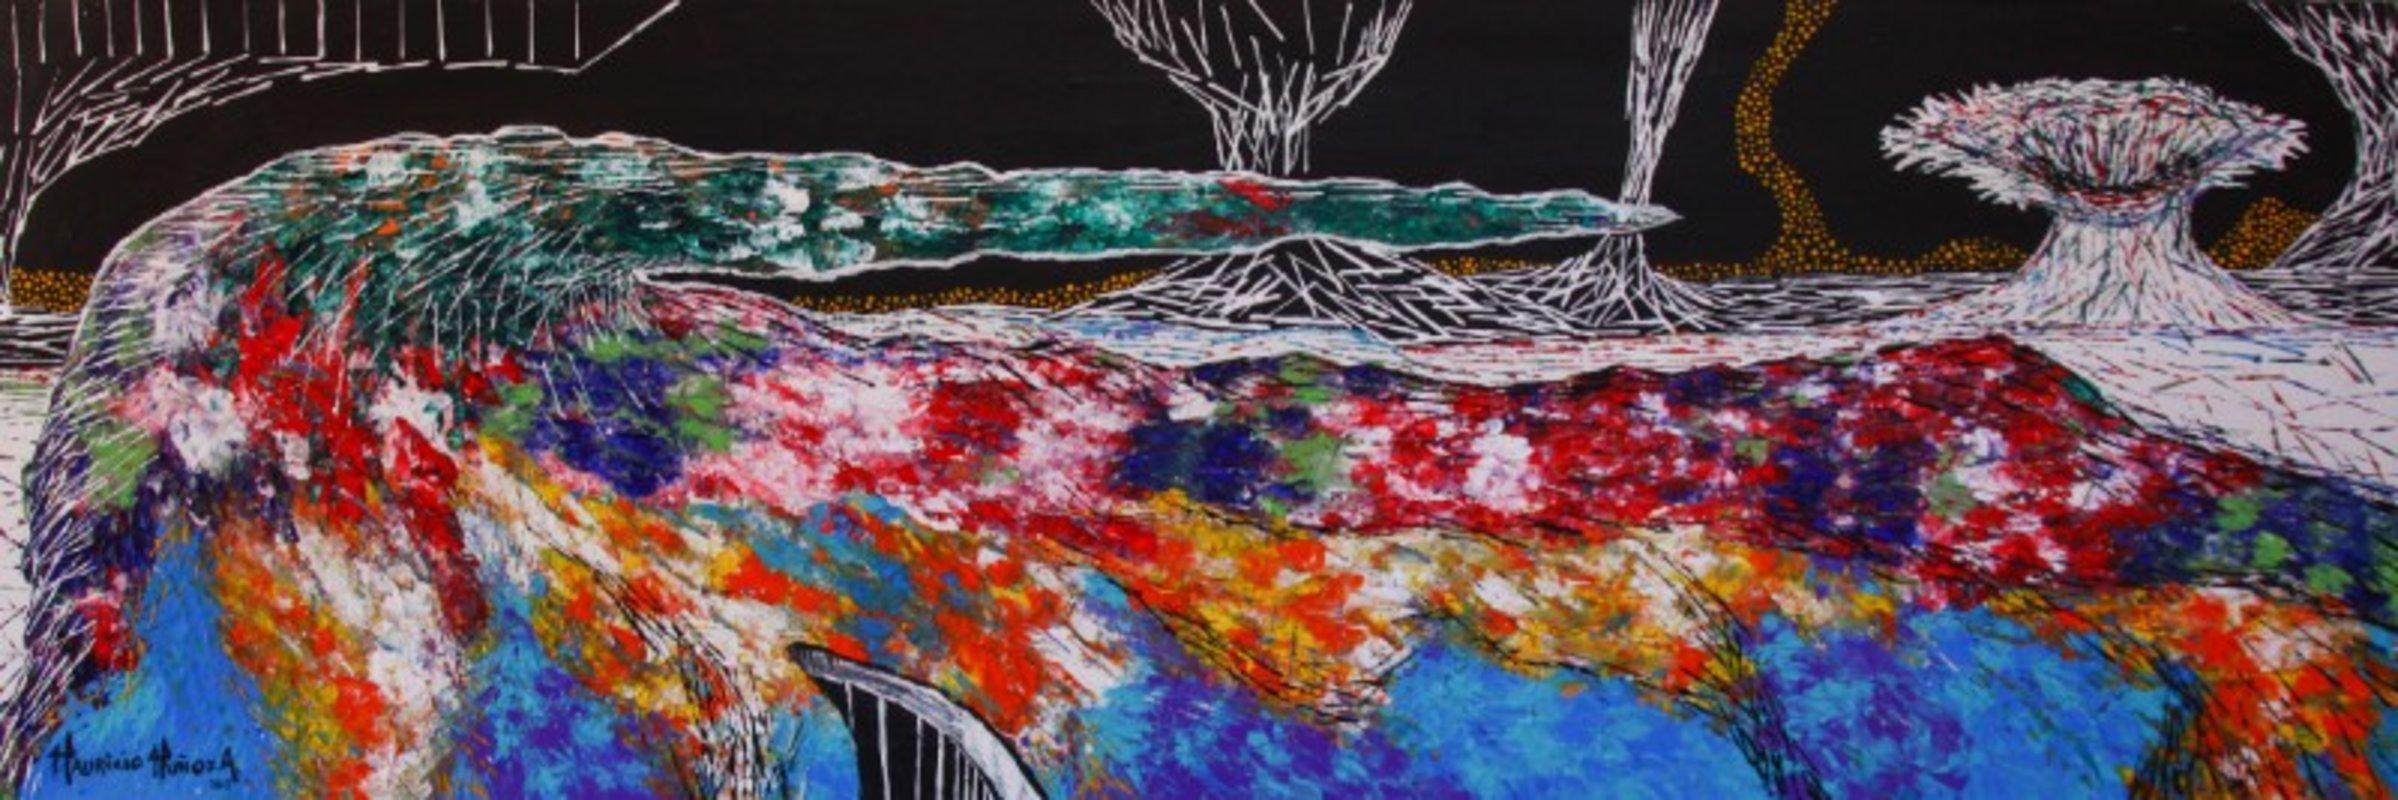 Abstracto  | Mauricio Muñoz A.